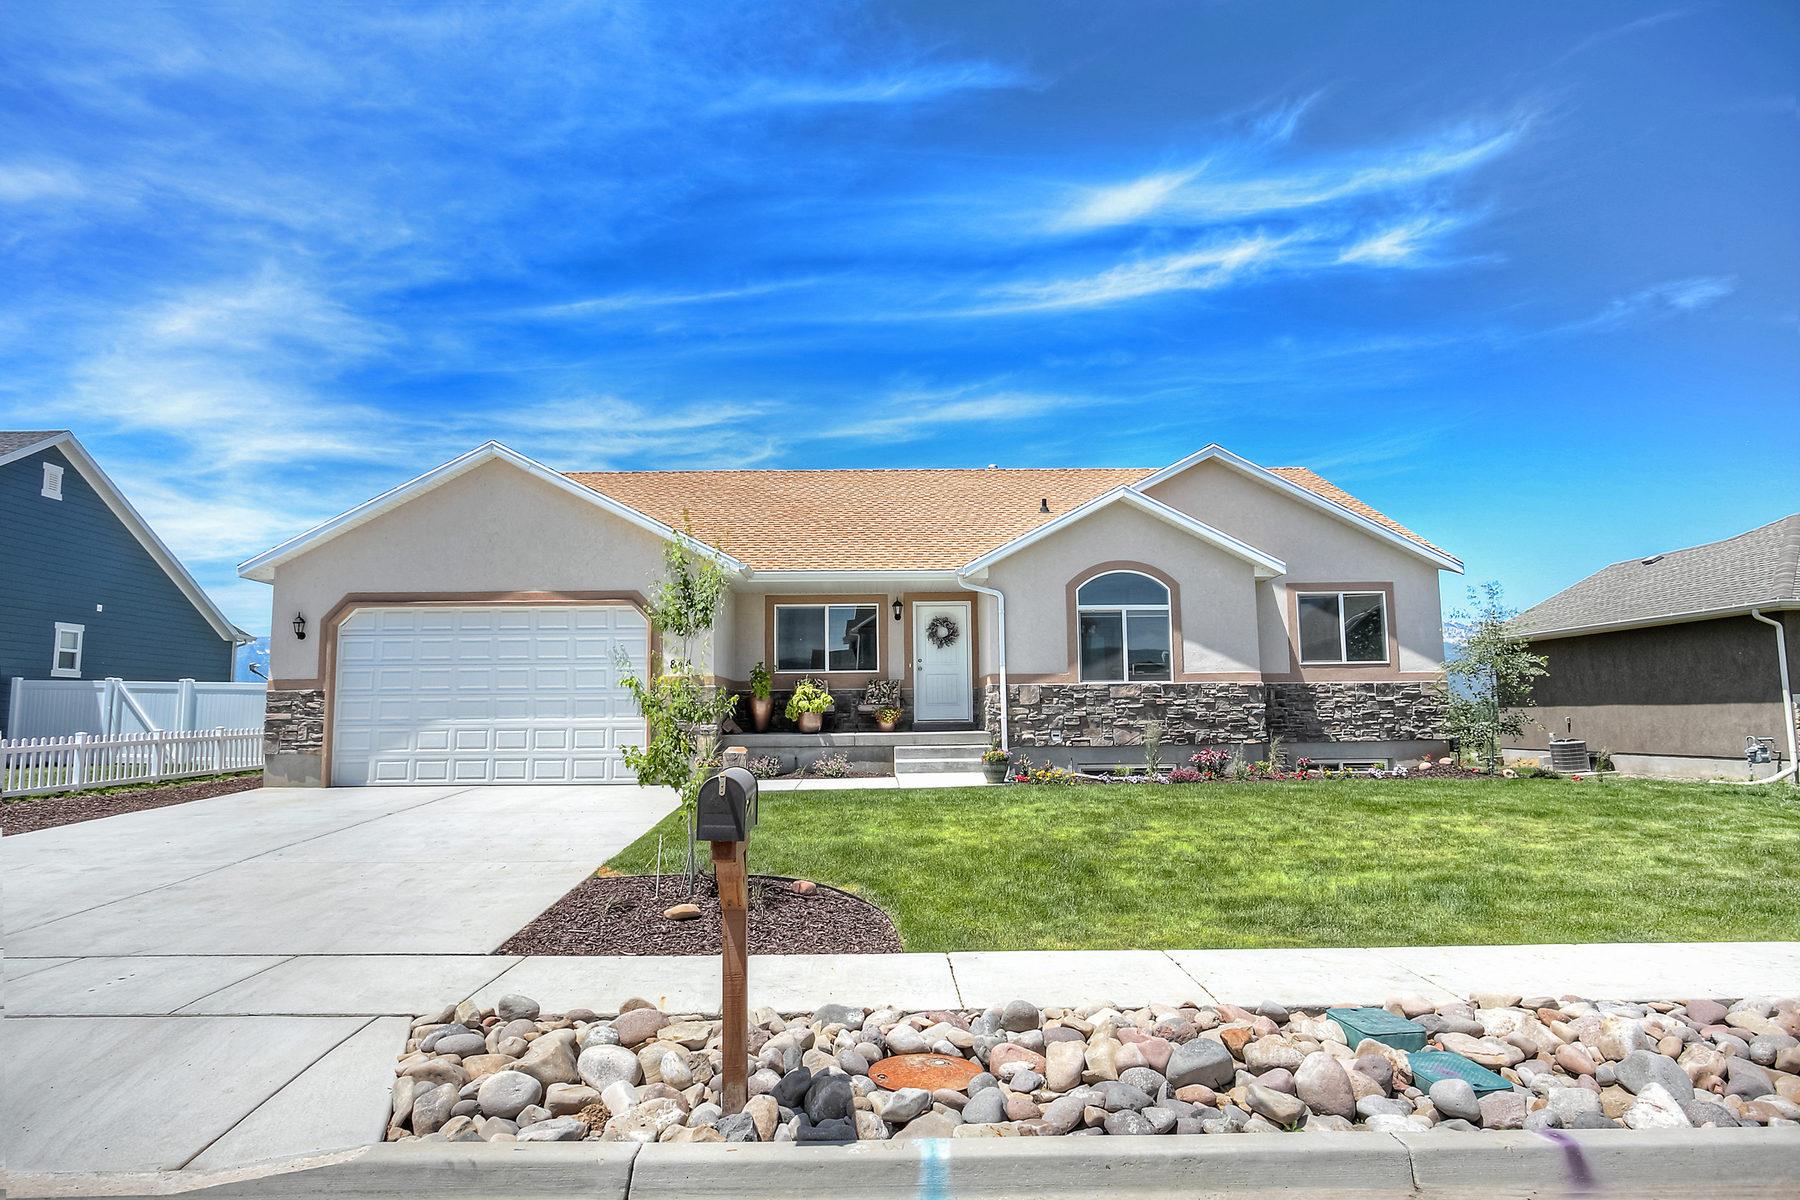 Villa per Vendita alle ore Immaculate Heber Home 844 S 820 E Heber City, Utah 84032 Stati Uniti